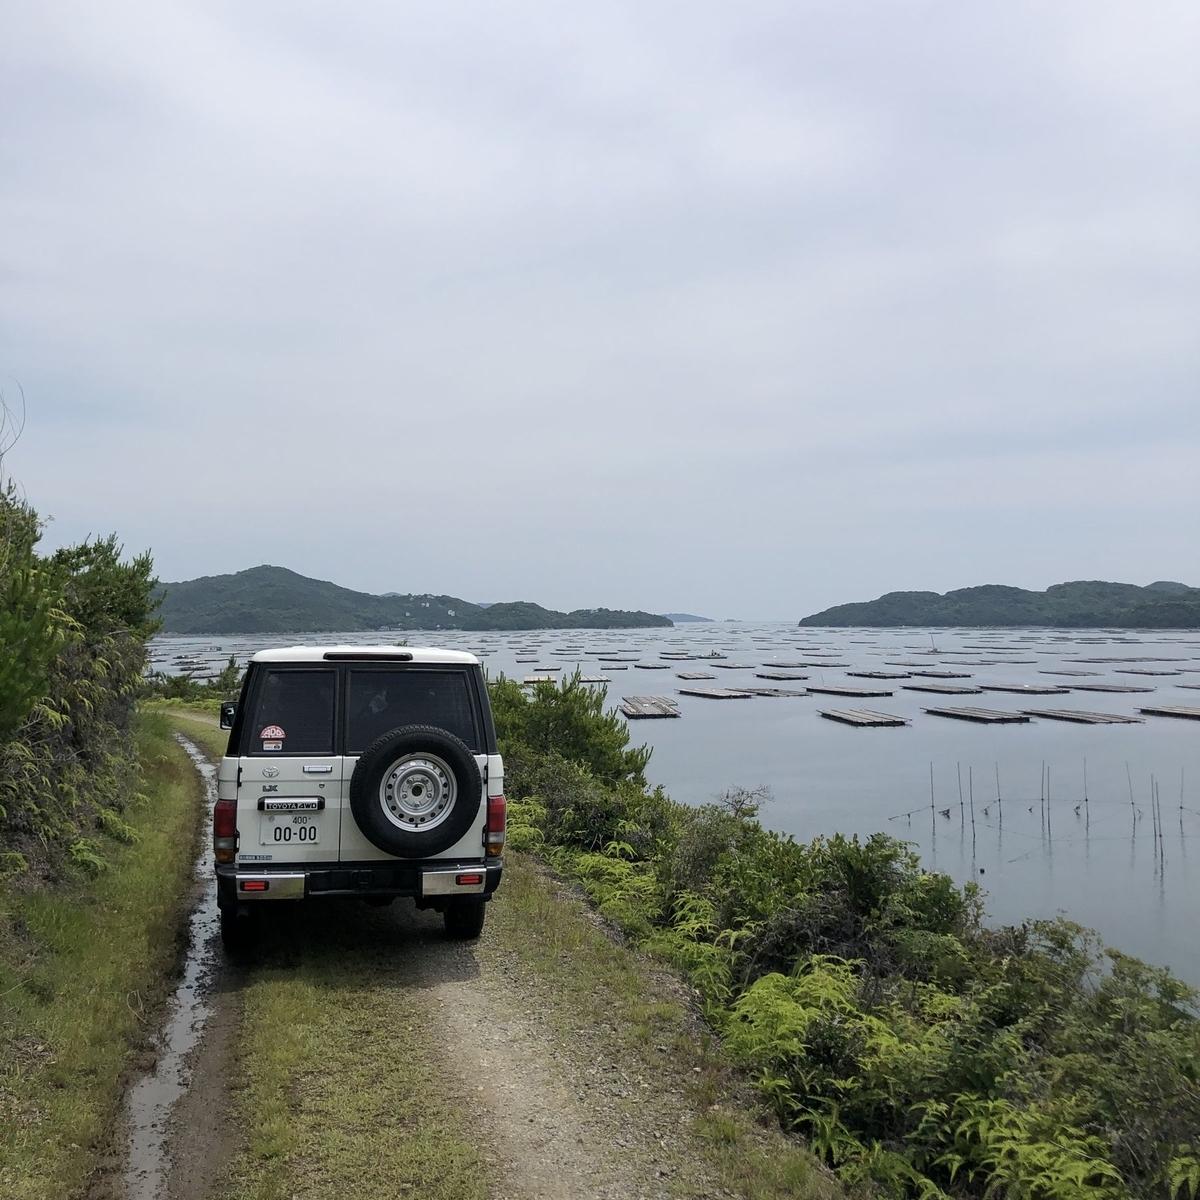 f:id:shiratsume:20200625183305j:plain